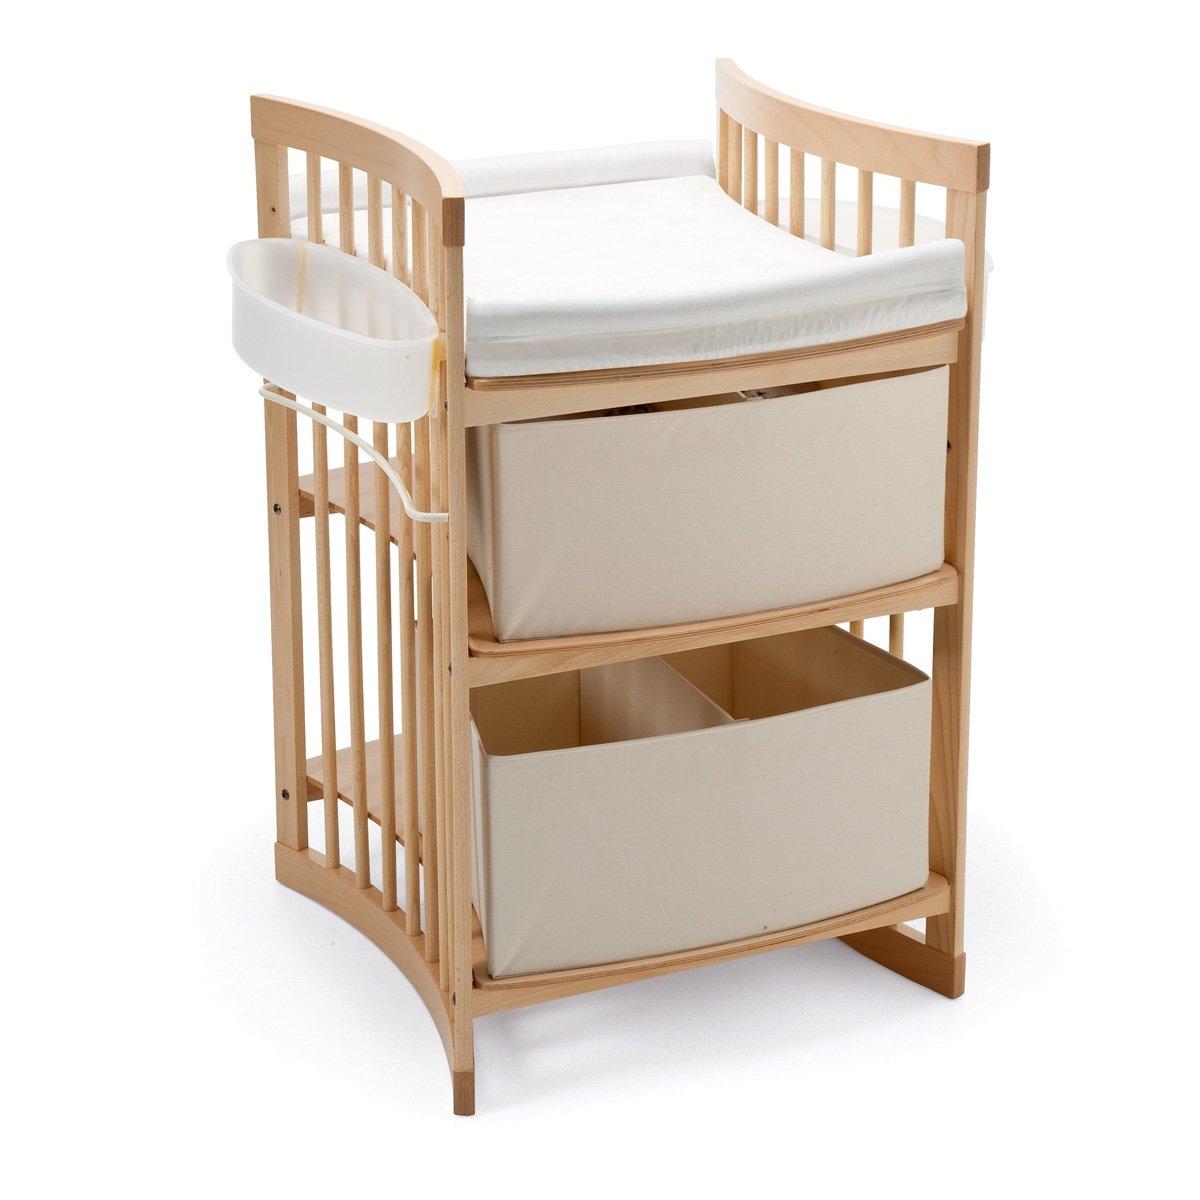 stokke sleepi crib natural amazonca baby - stokke care changing table natural